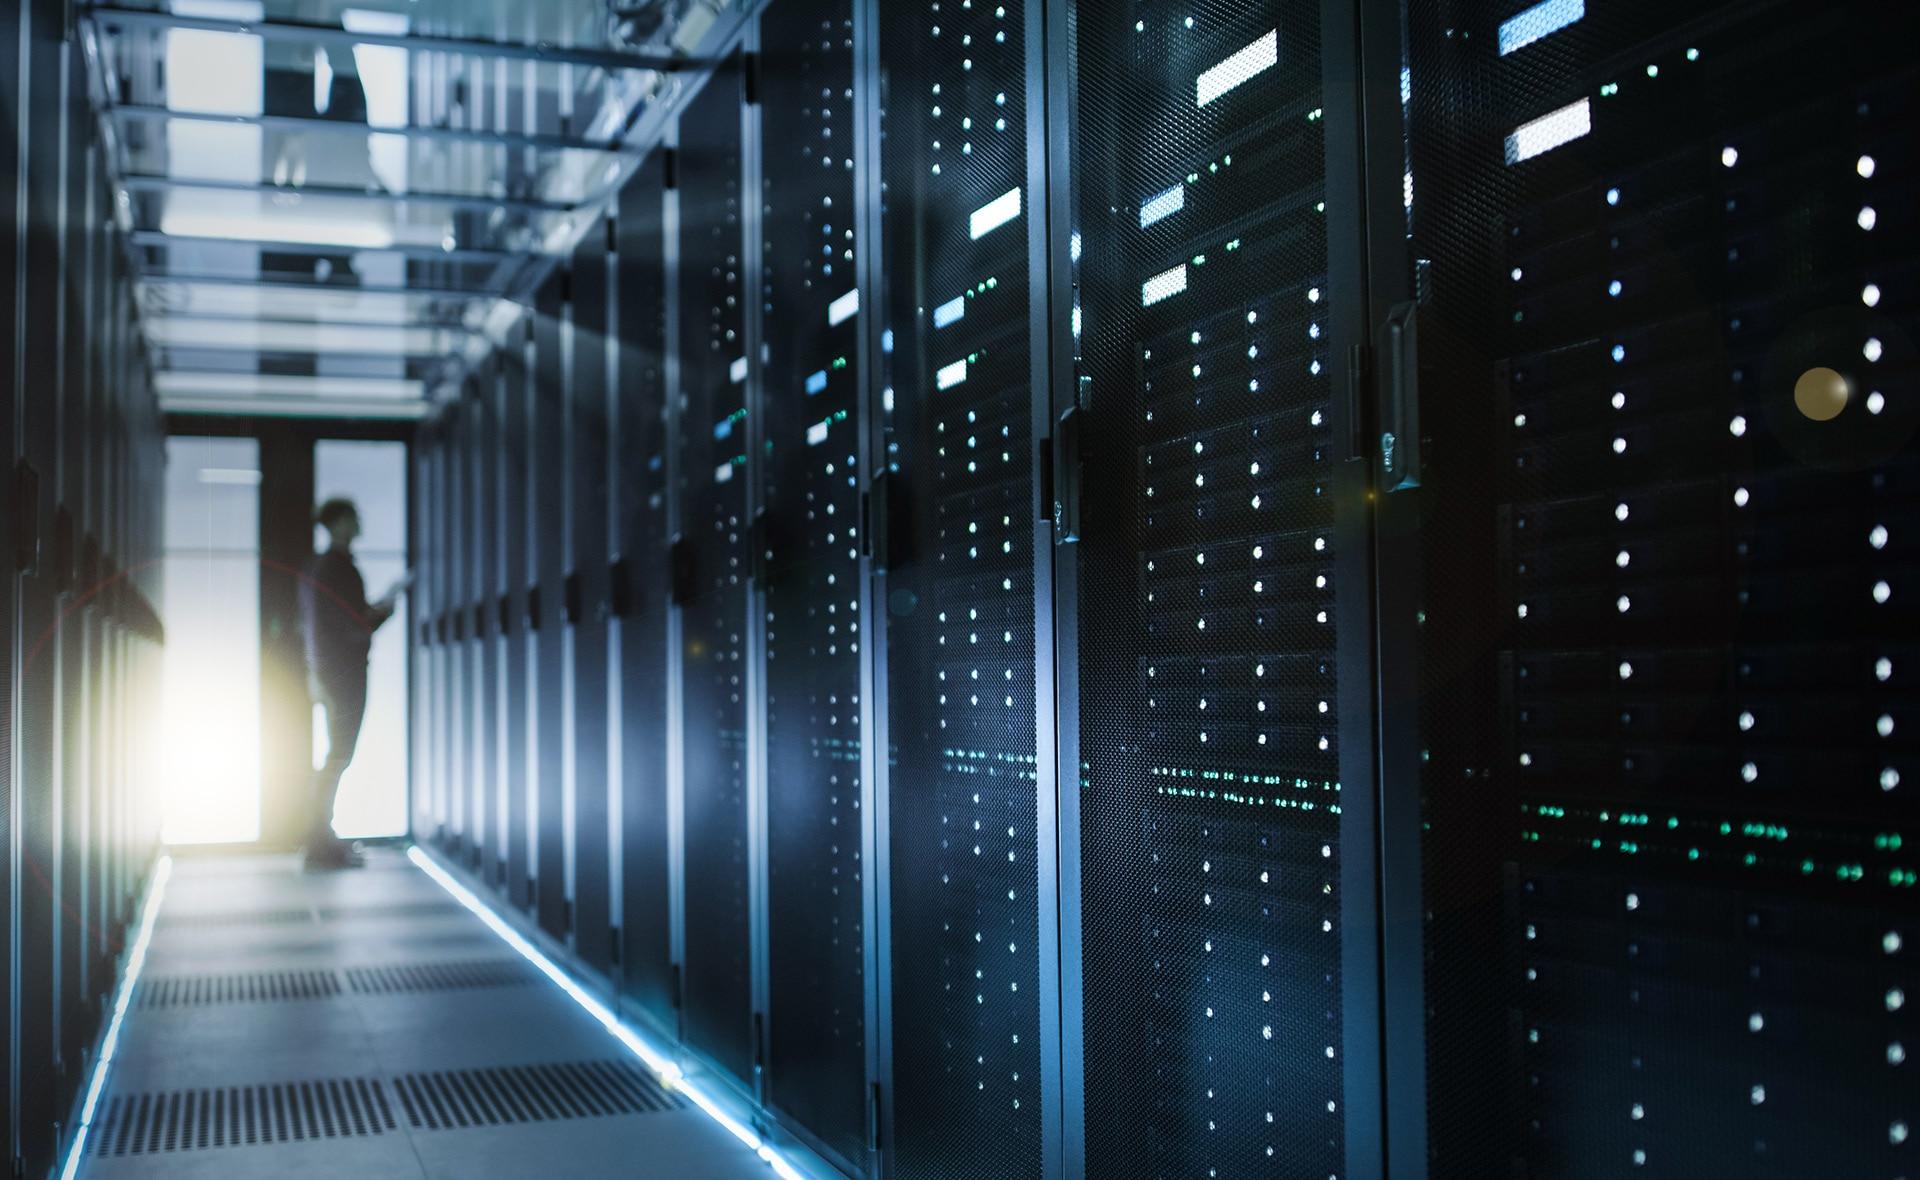 data_centers-cib-operacion-sostenibilidad-Nabiax-bbva-acuerdo